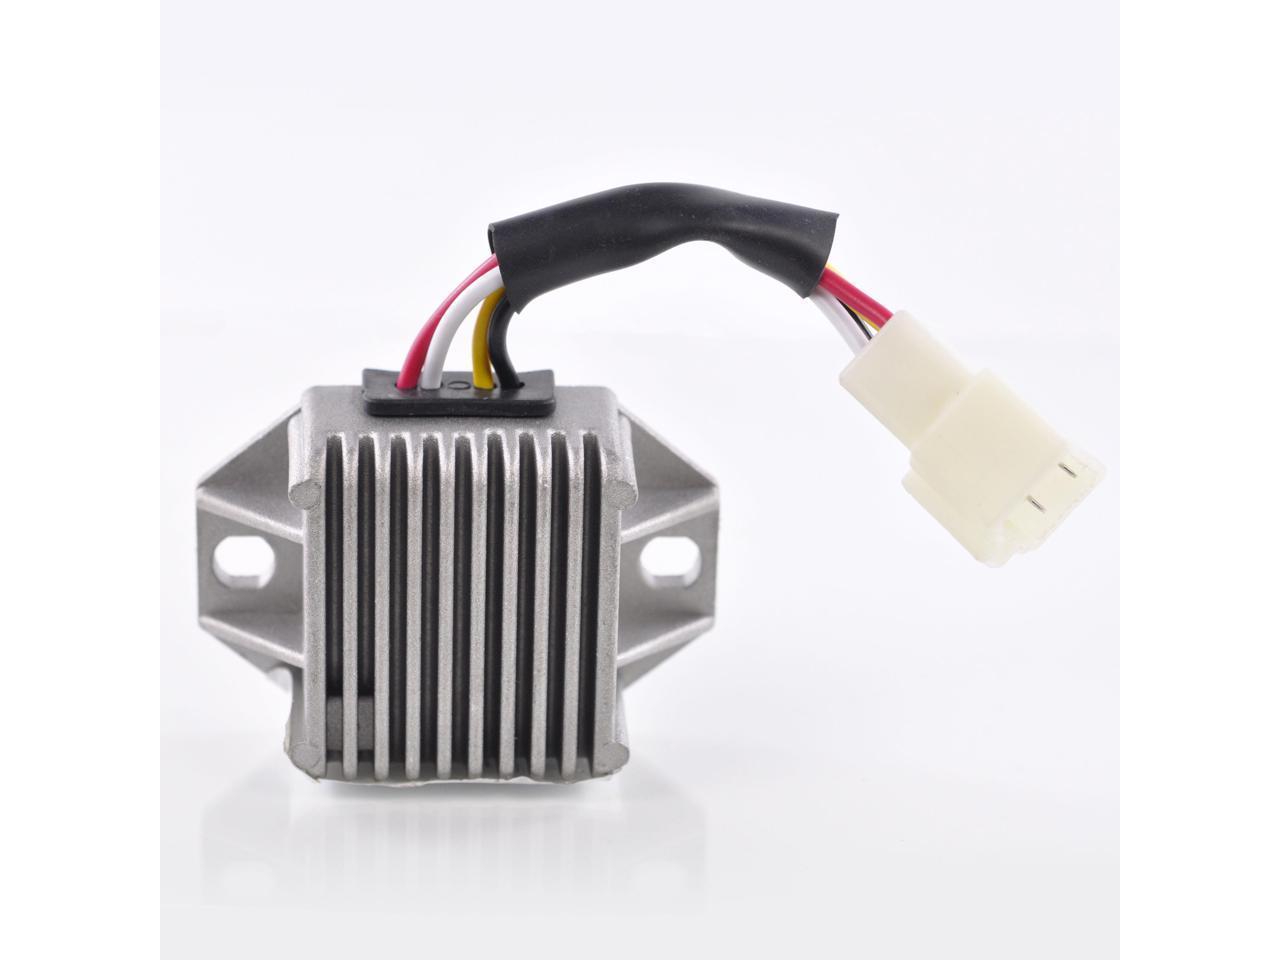 XS 360 400 500 Voltage Regulator Rectifier For Yamaha TX 500 RD 400 1973-1982 OEM Repl.# 371-81910-10-00 371-81910-11-00 2G7-81910-50-00 1A0-81910-20-00 TX500 XS500 RD400